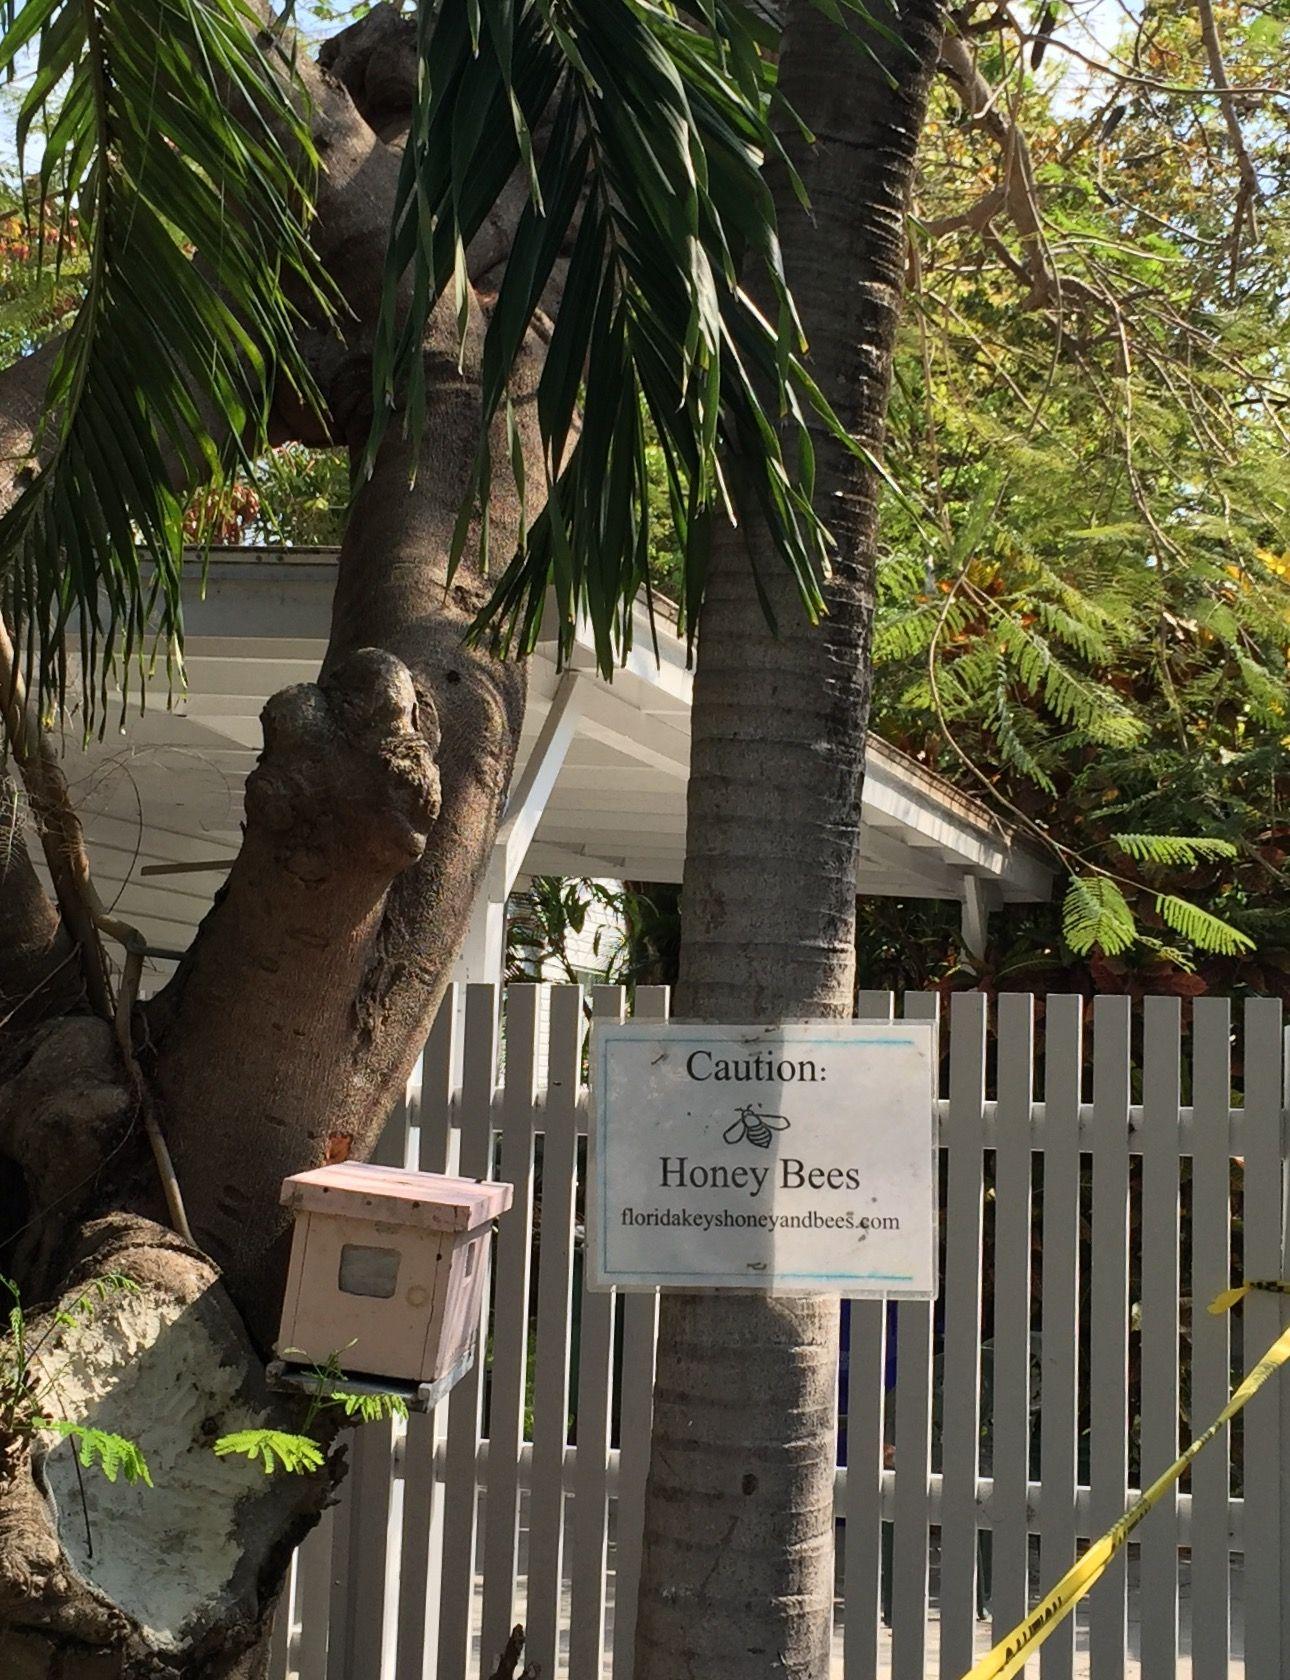 Making Florida Keys honey in a Key West back yard on Whalton Street.